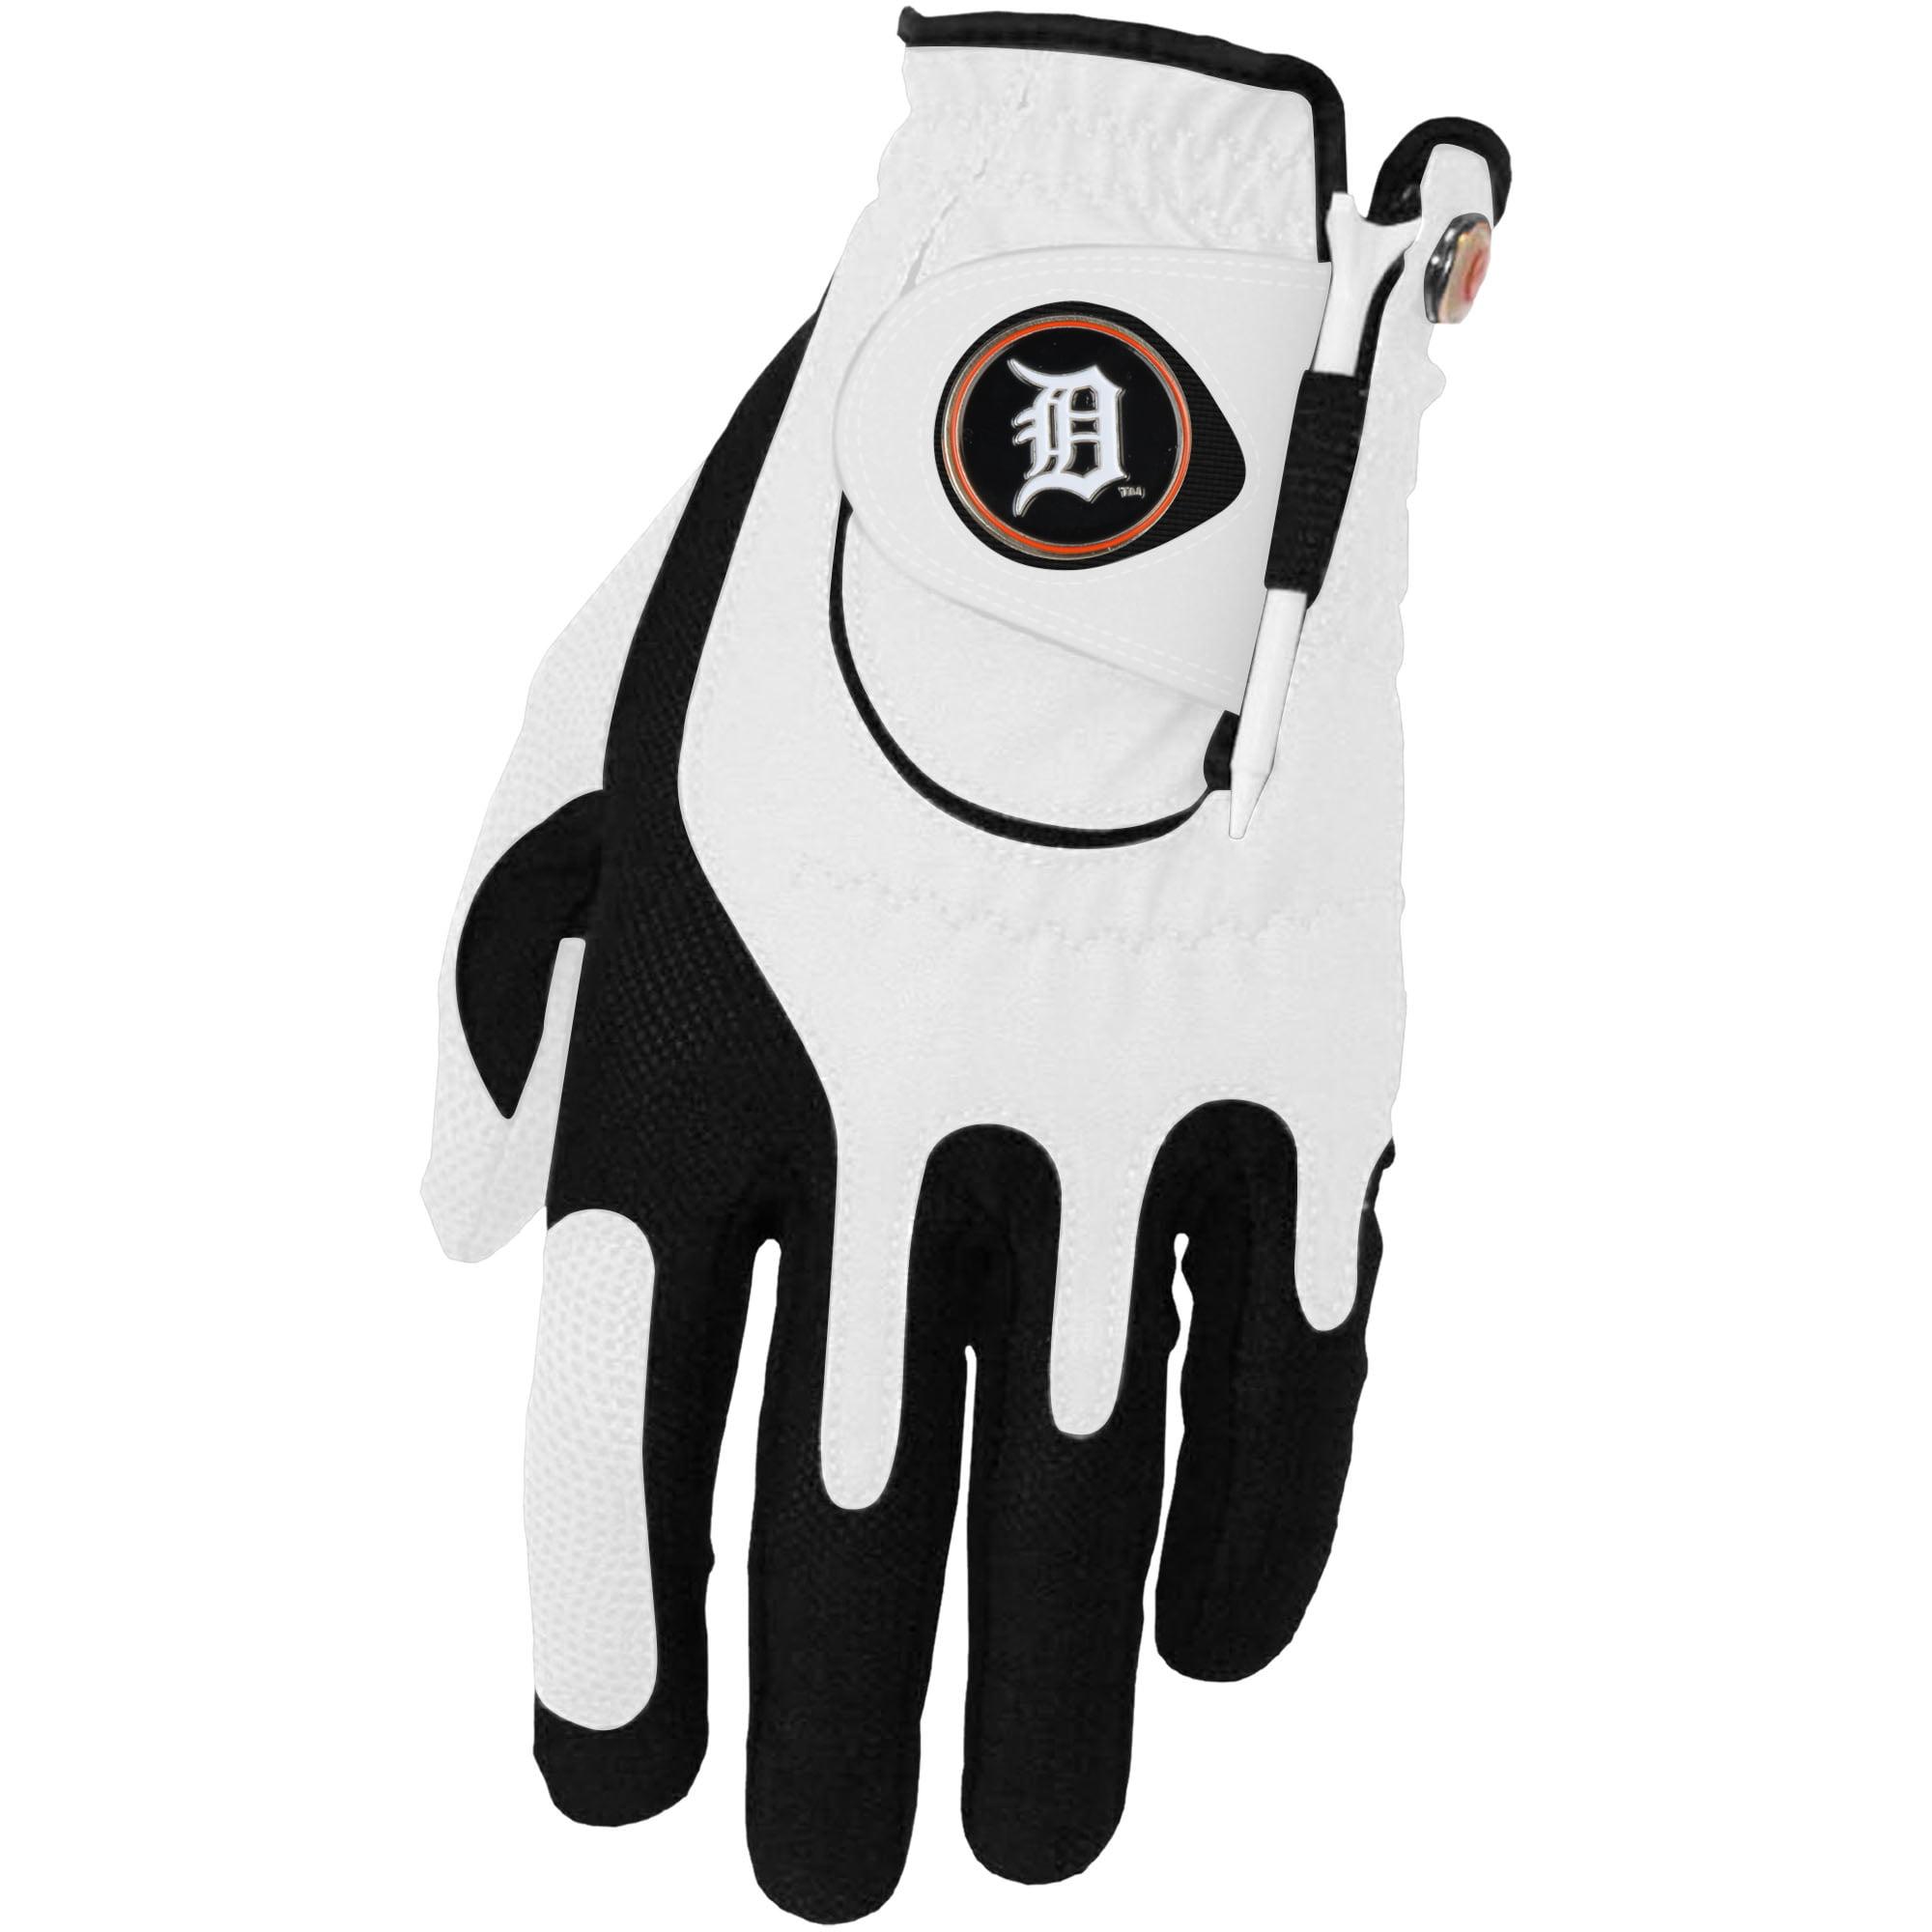 Detroit Tigers Left Hand Golf Glove & Ball Marker Set - White - OSFM